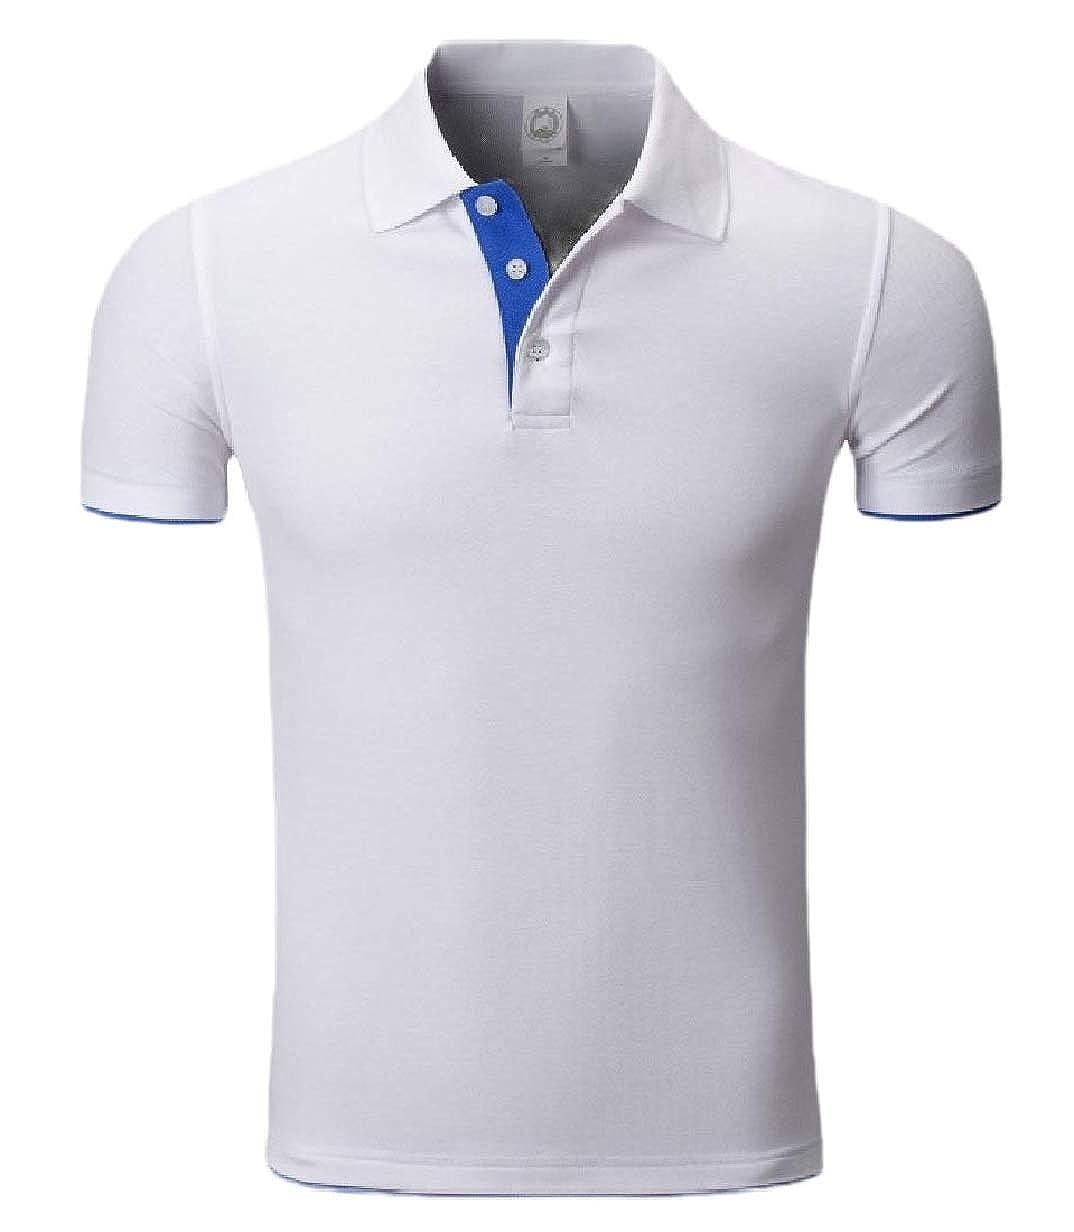 CBTLVSN Mens Solid Color Summer Slim Linen Cotton Short Sleeve Polo T Shirts